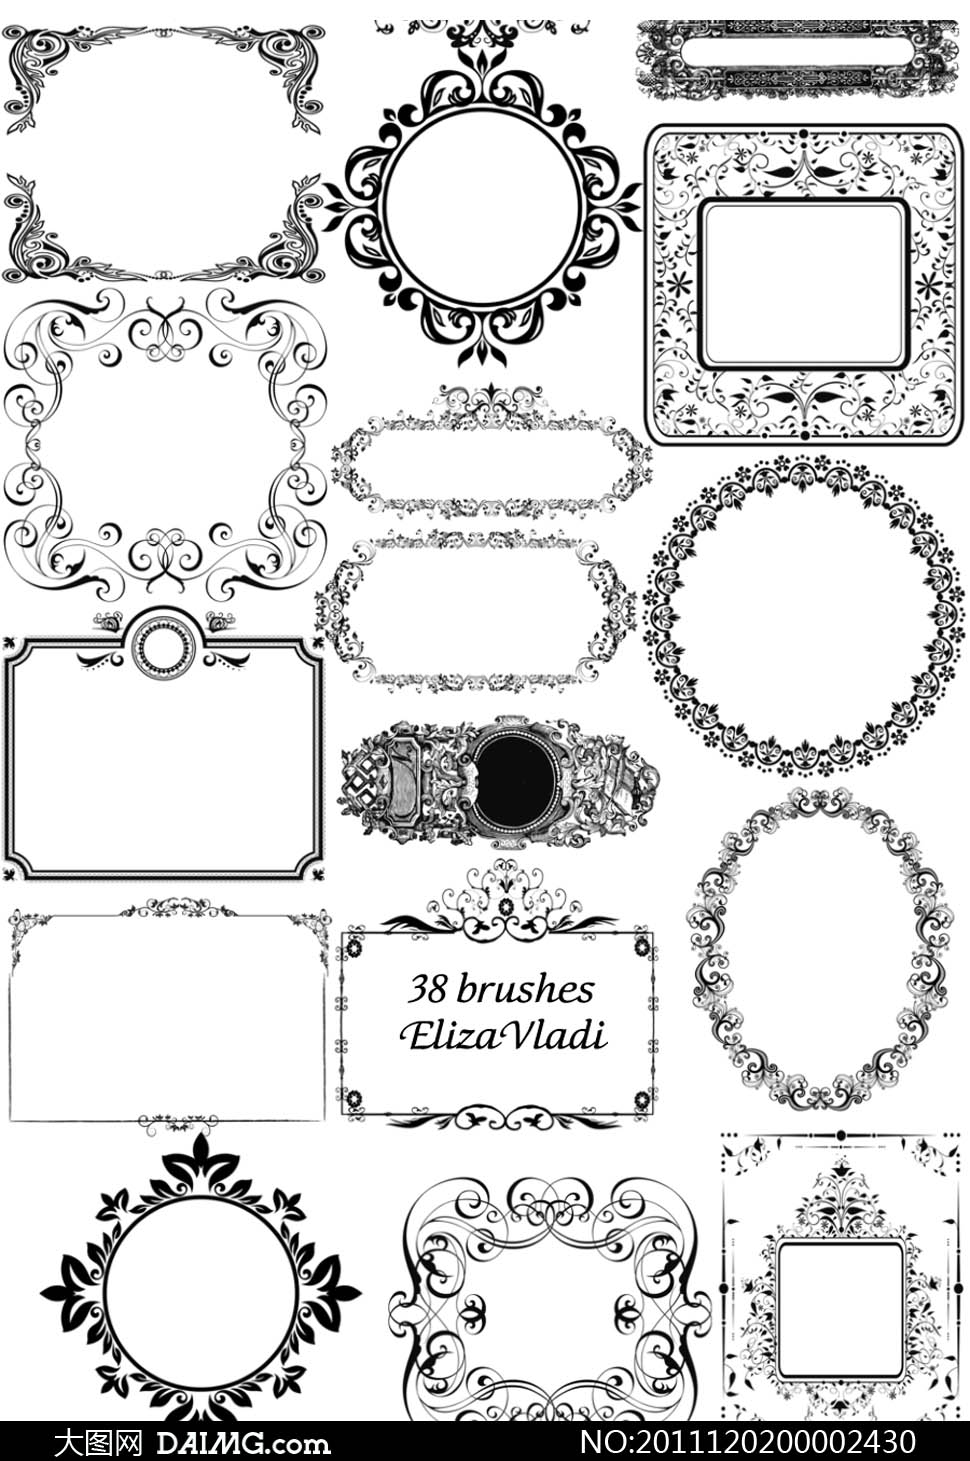 framesbrushes花纹花边边框相框古典ps笔刷ps素材